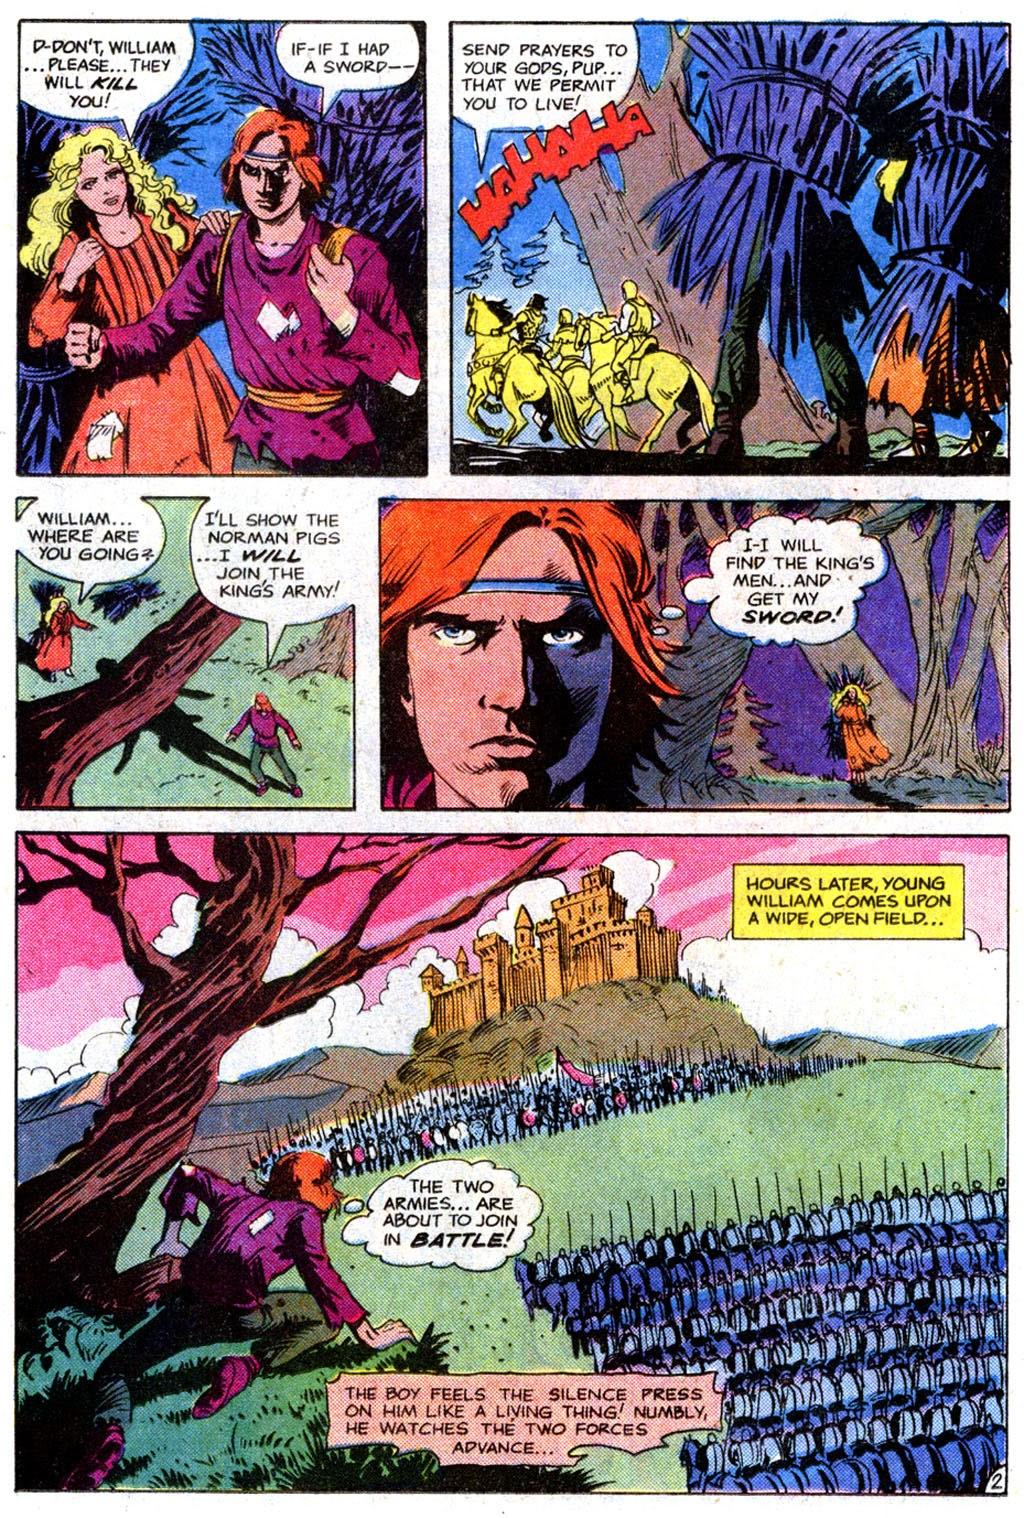 Read online Sgt. Rock comic -  Issue #358 - 21